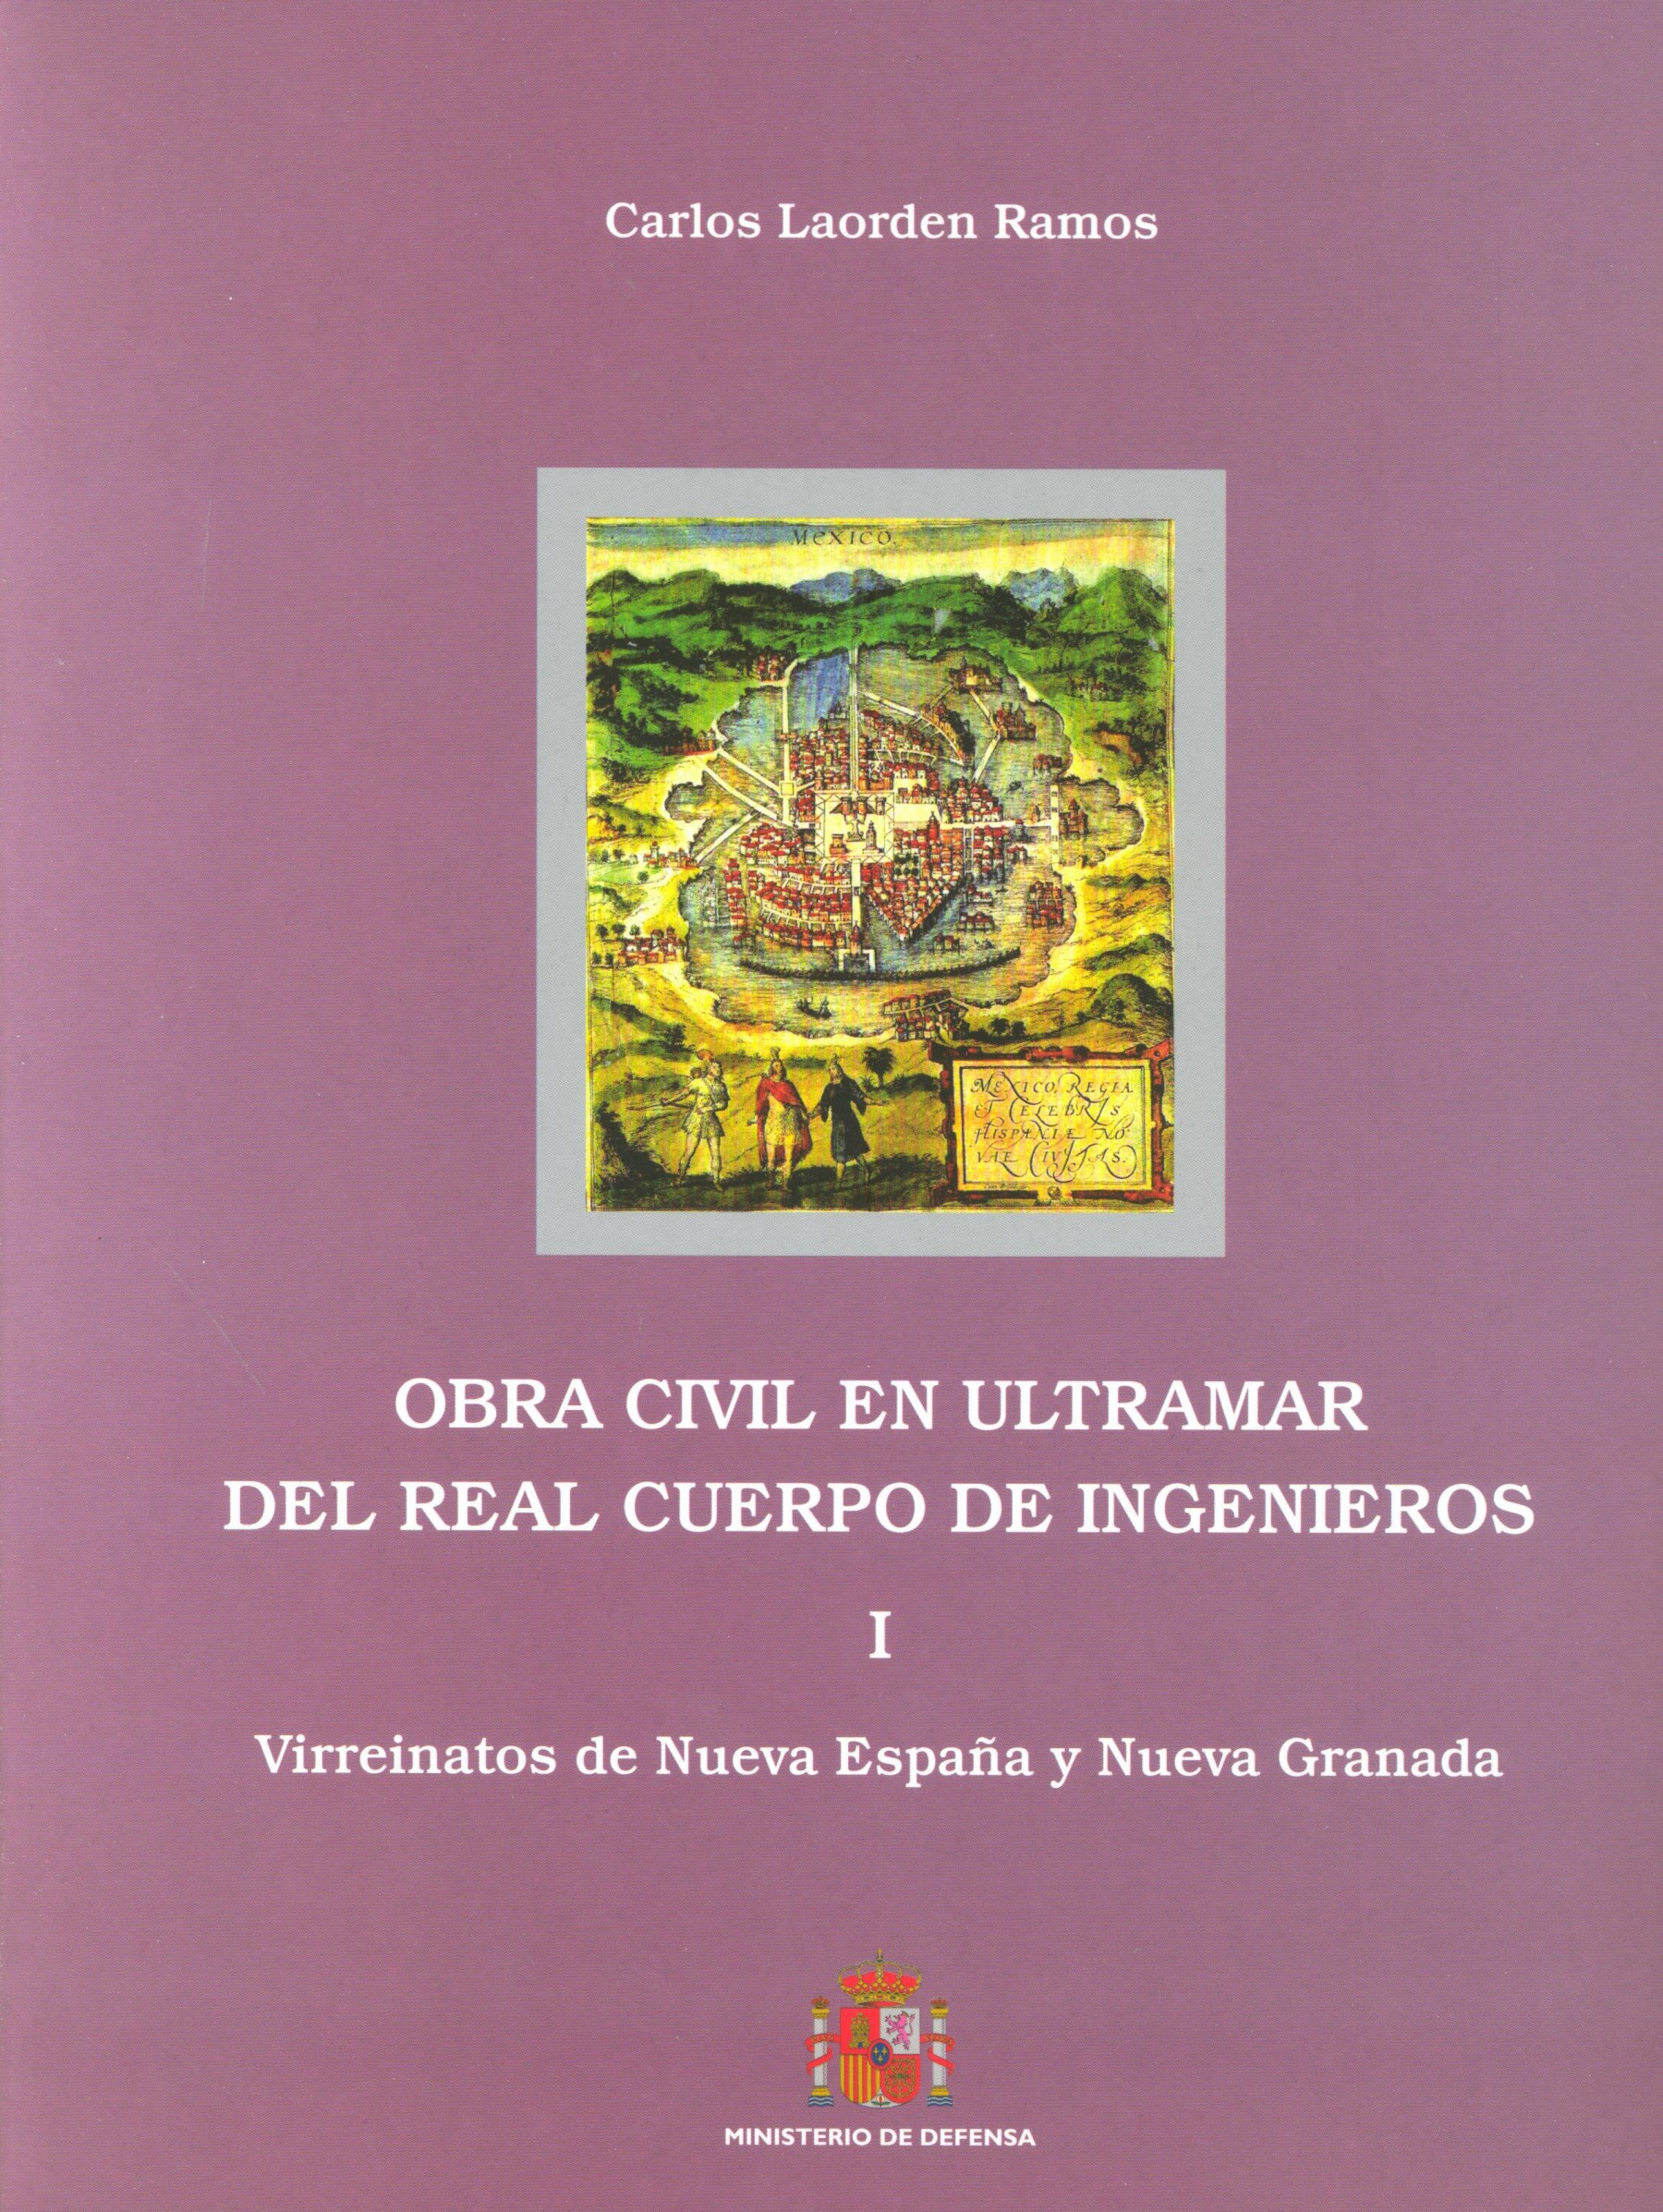 OBRA CIVIL EN ULTRAMAR DEL REAL CUERPO DE INGENIEROS